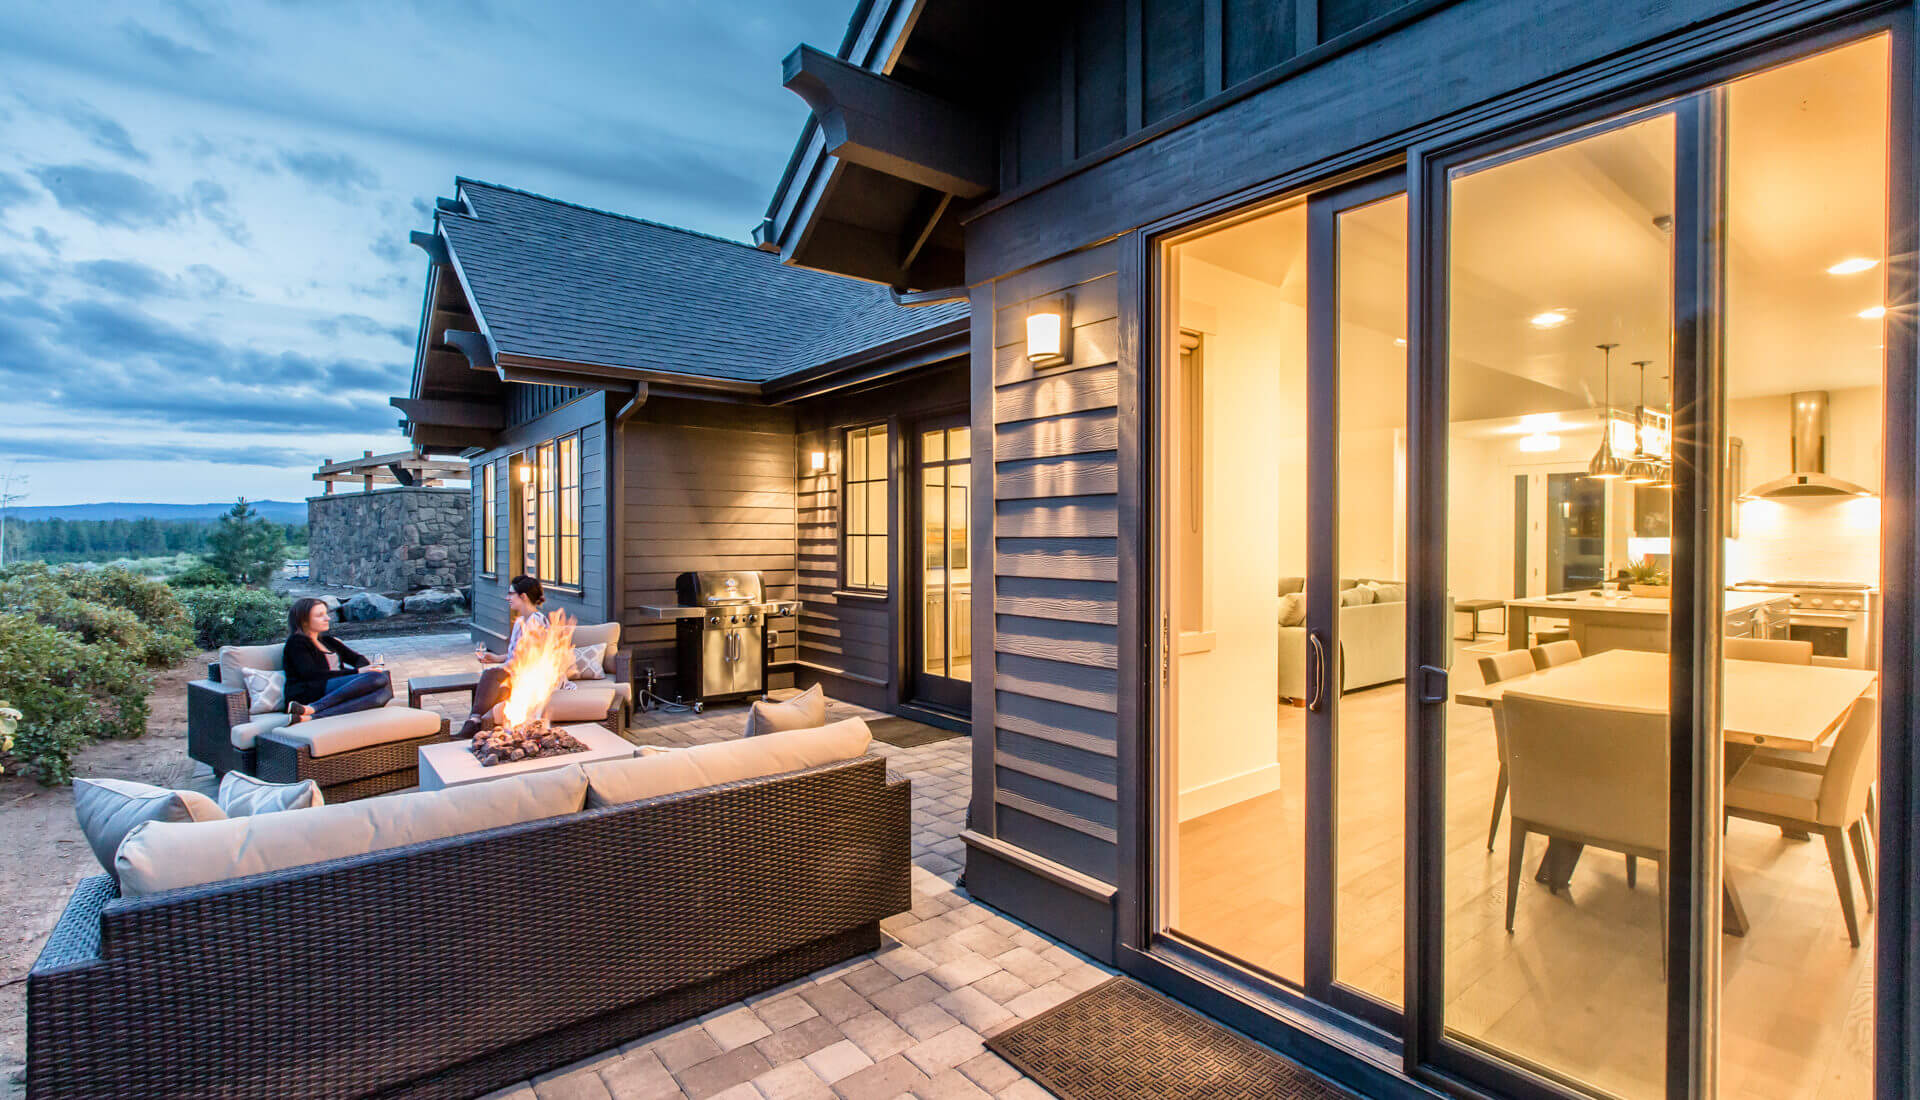 tetherow-vacation-rental-alpine-22-53-1920x1100